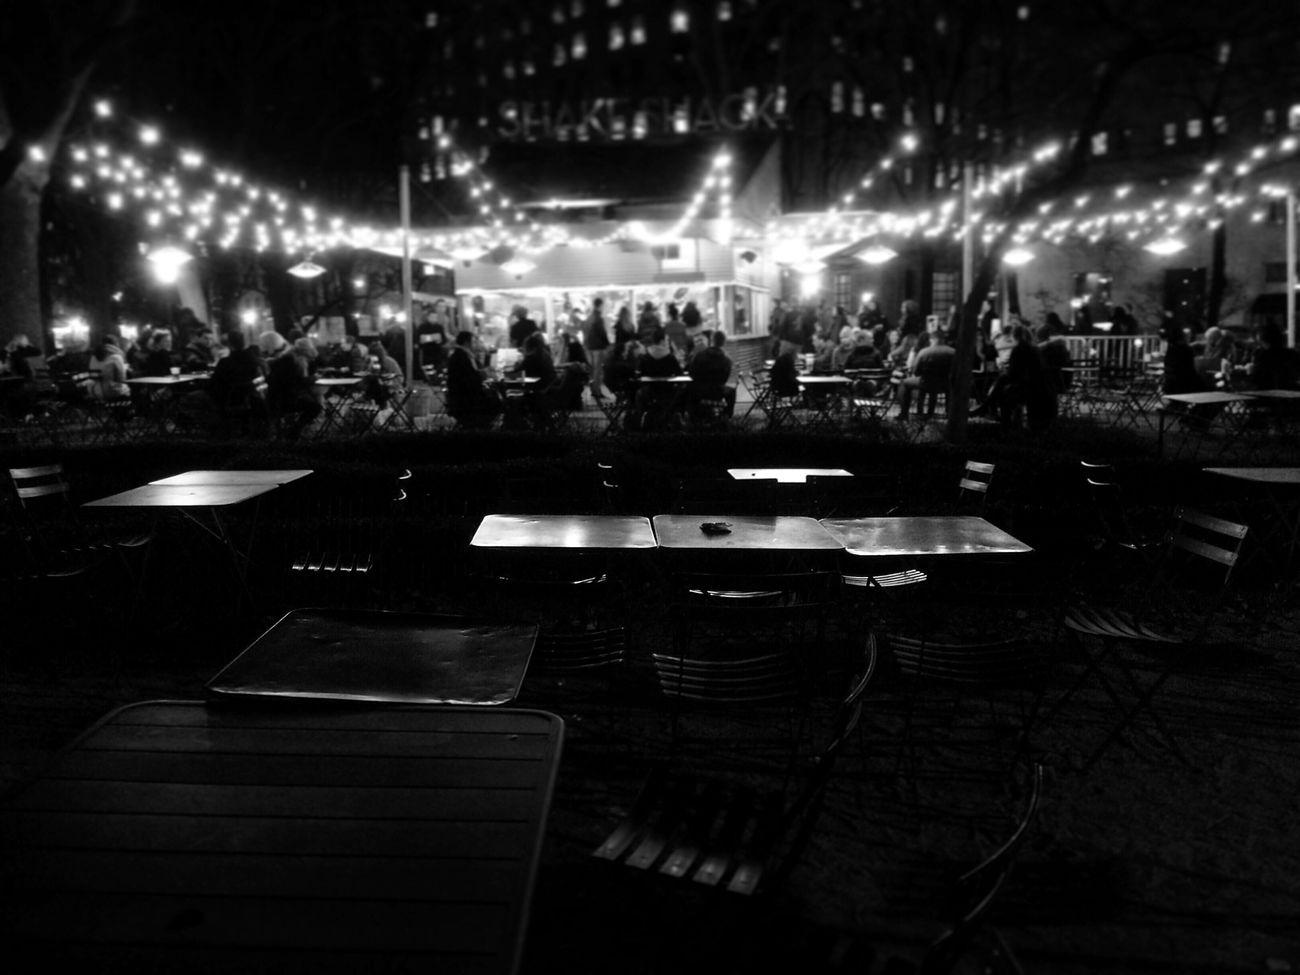 Bw Bwstreetphotography Nightphotography Newyork Shakeshack Restaurant First Eyeem Photo